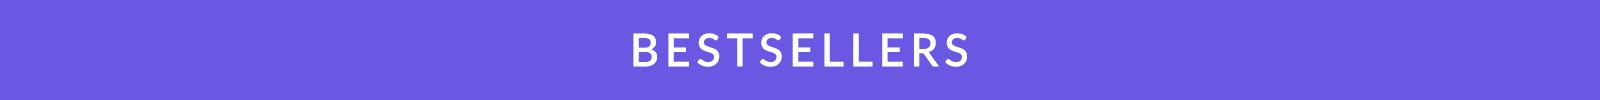 Holika Flagship Bestseller Banner